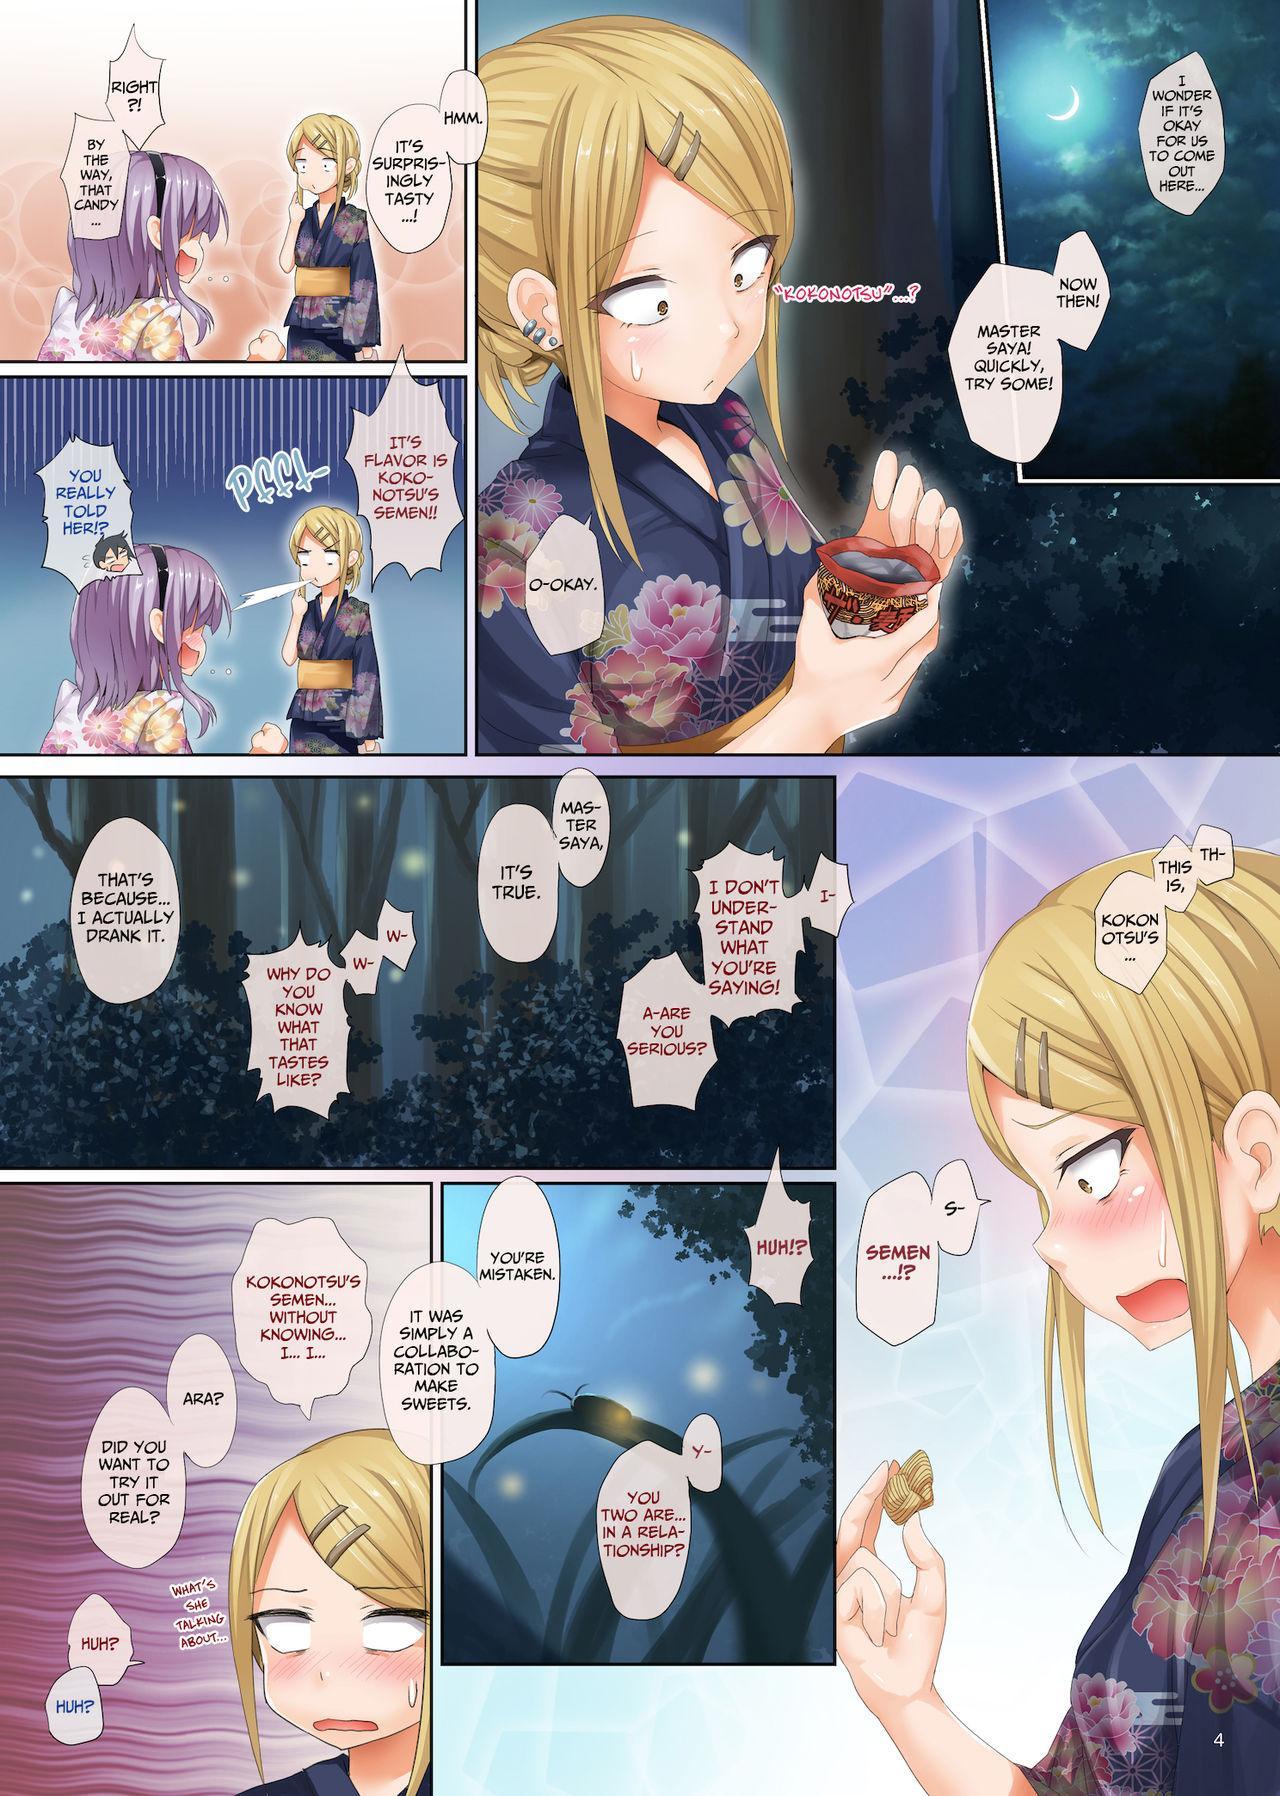 Seika no Musume Daga, Shikashi Hentai 3 | The Candy Consextioner is Nothing More Than a Pervert 3 4